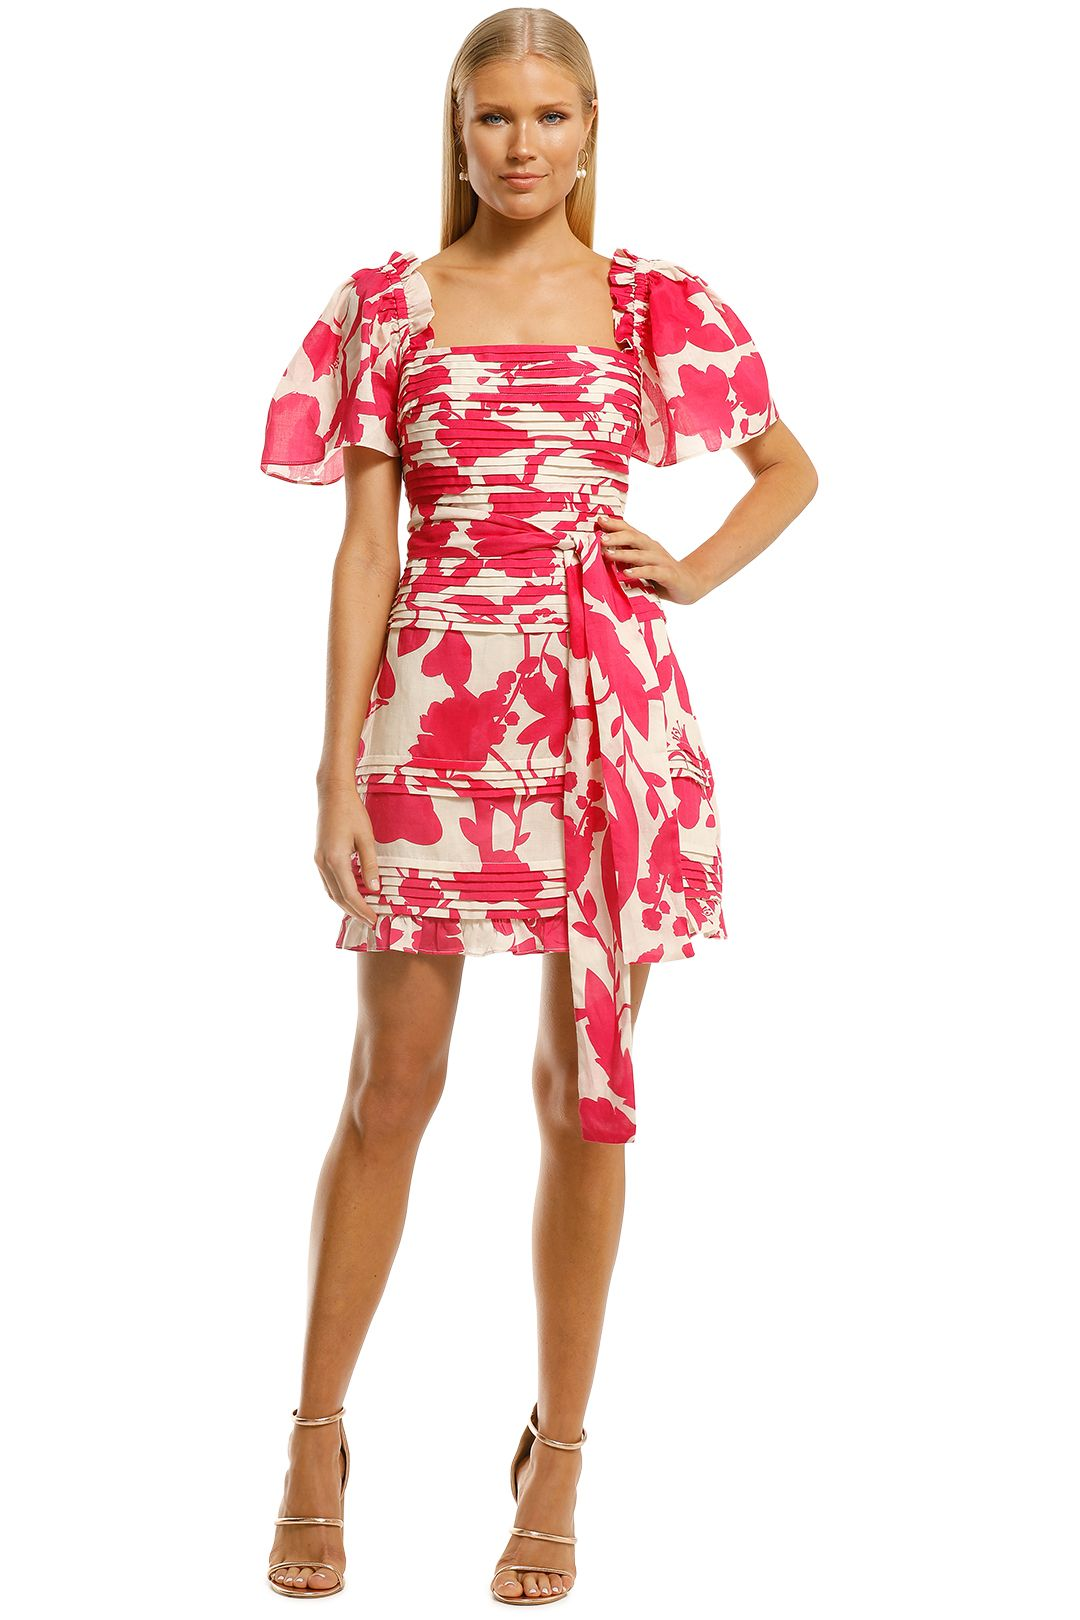 Talulah-Little-Things-Mini-Dress-Tealight-Garden-Front